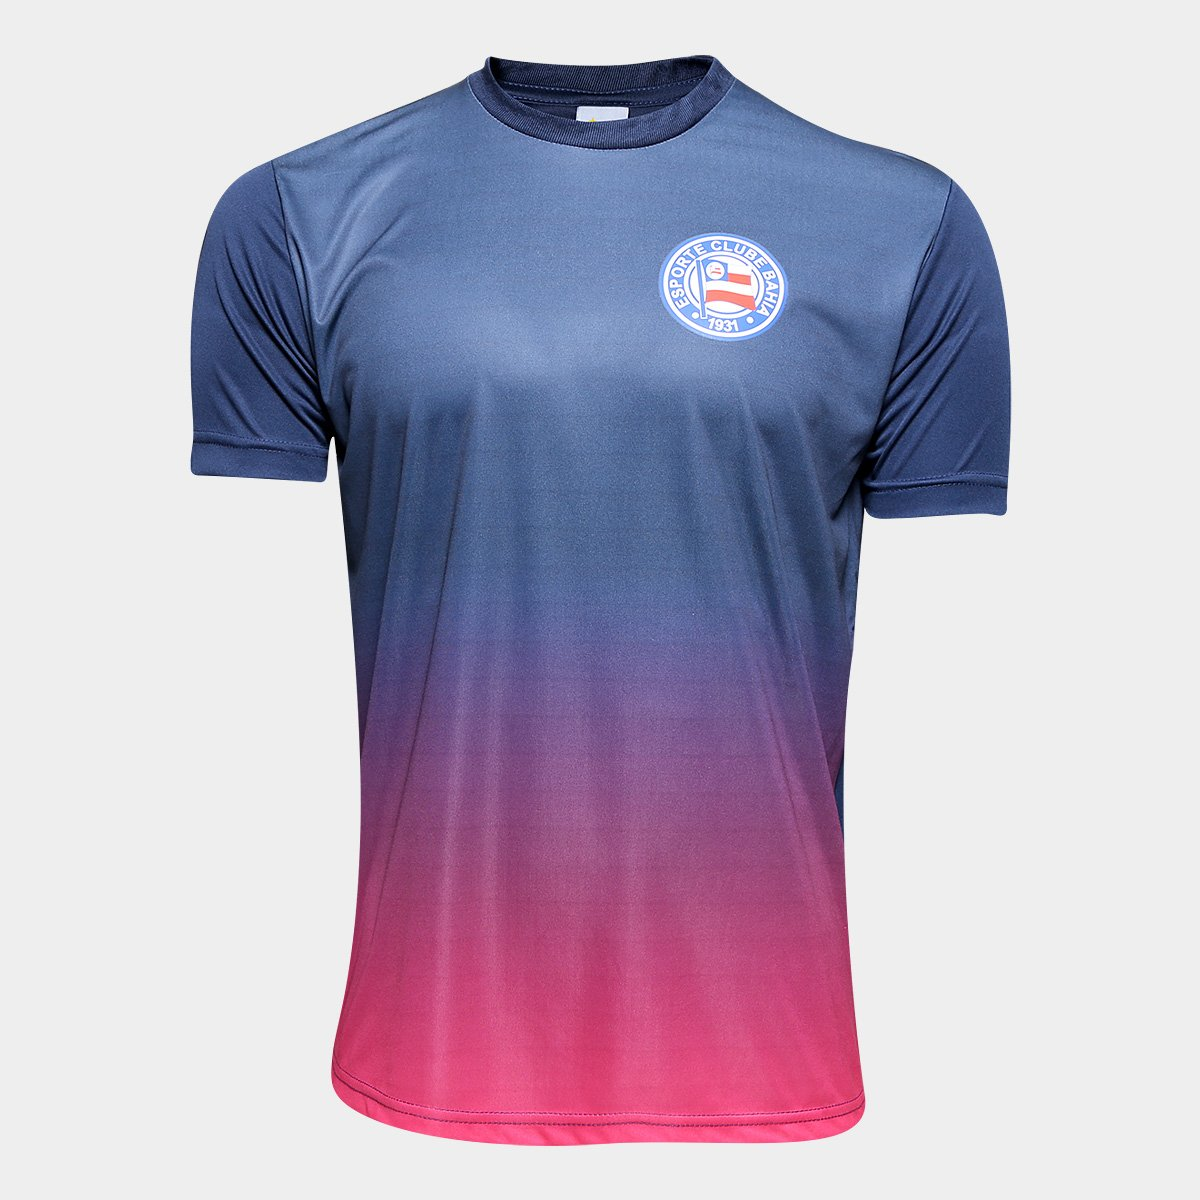 Camisas de Time Nacionais e Internacionais  56da7c7ee1338